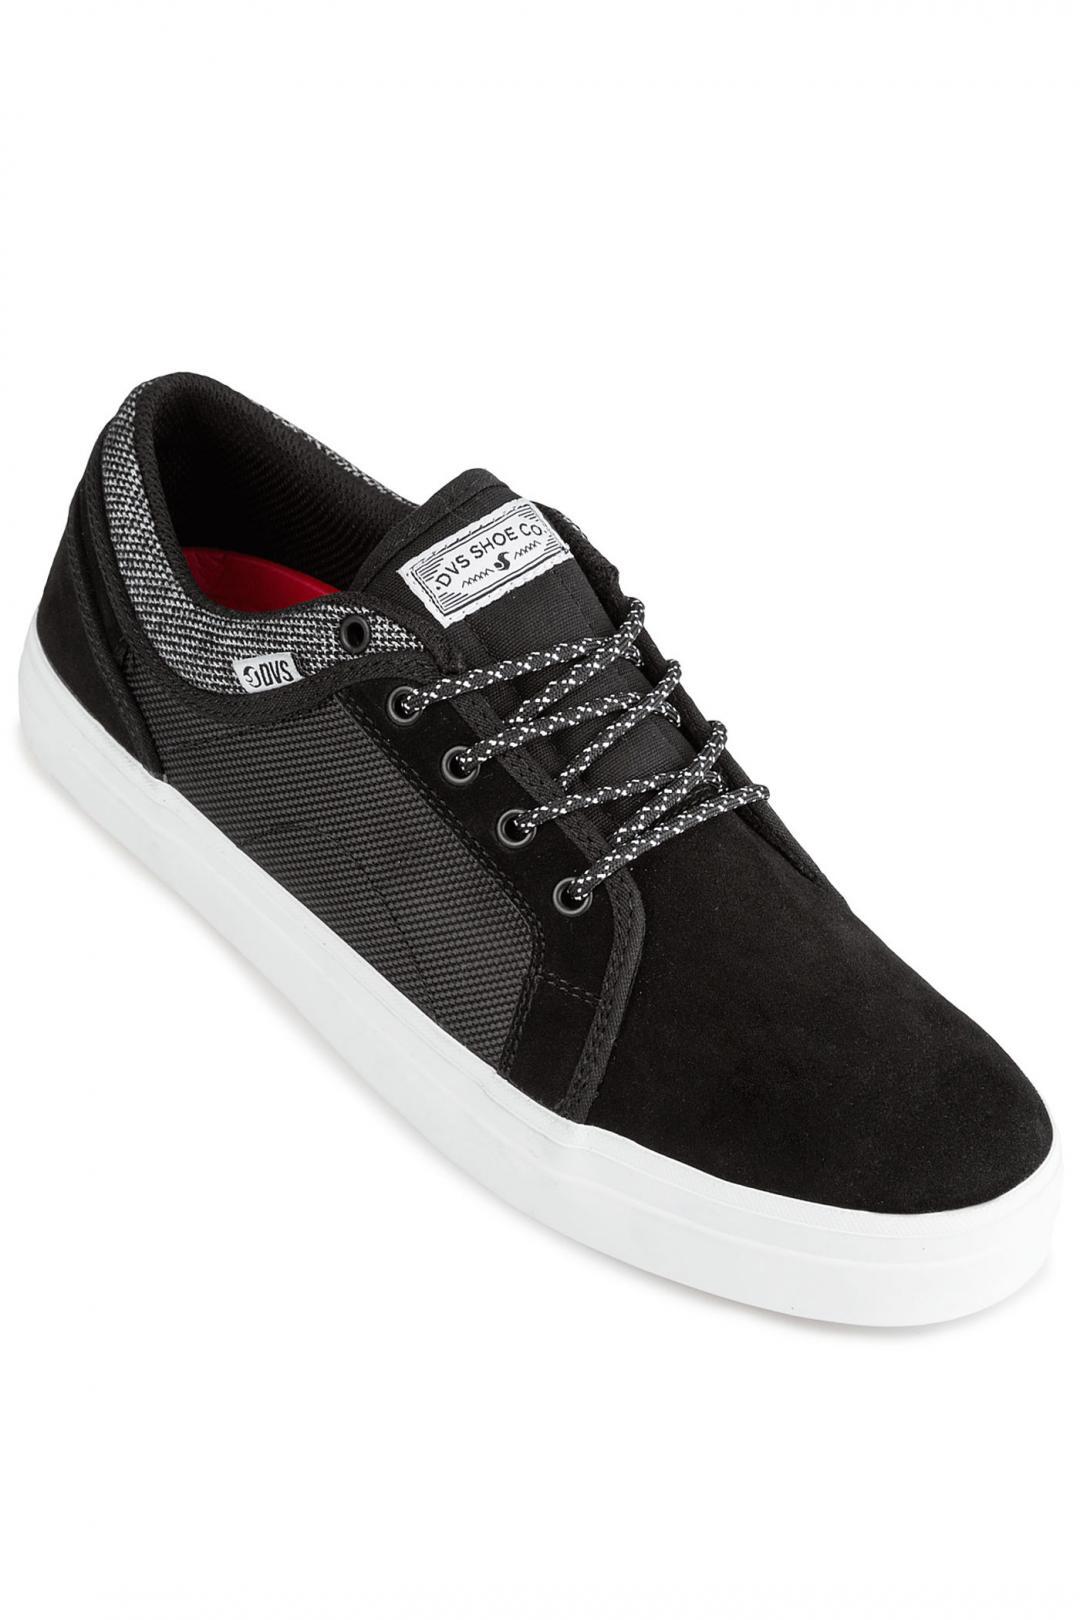 Uomo DVS Aversa+ Suede black   Sneaker